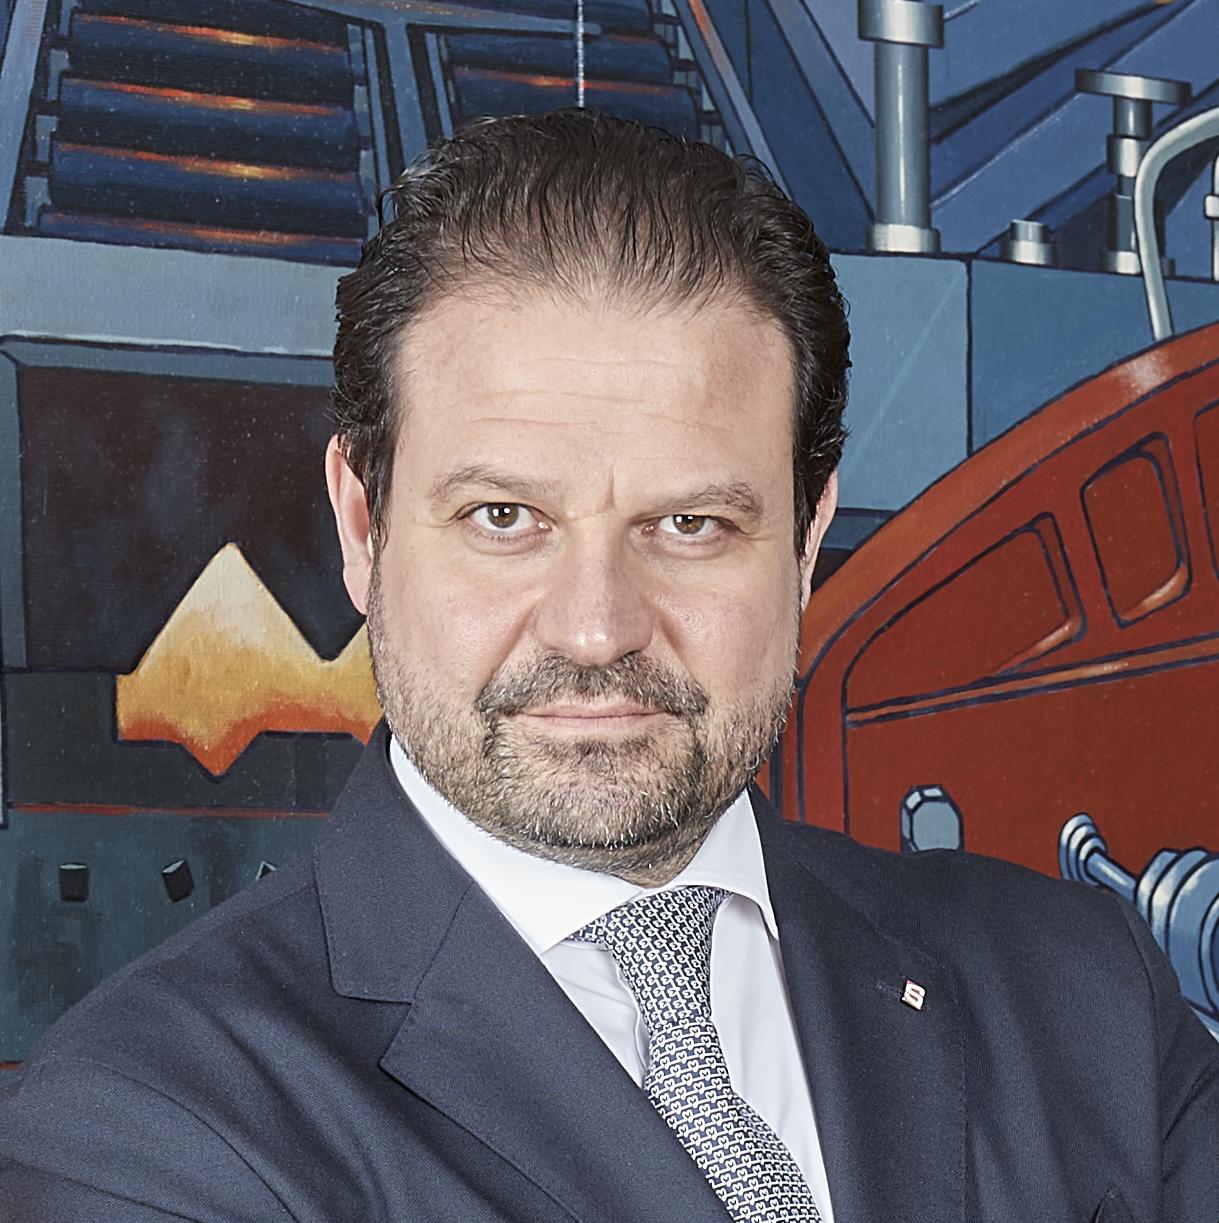 Paolo Streparava